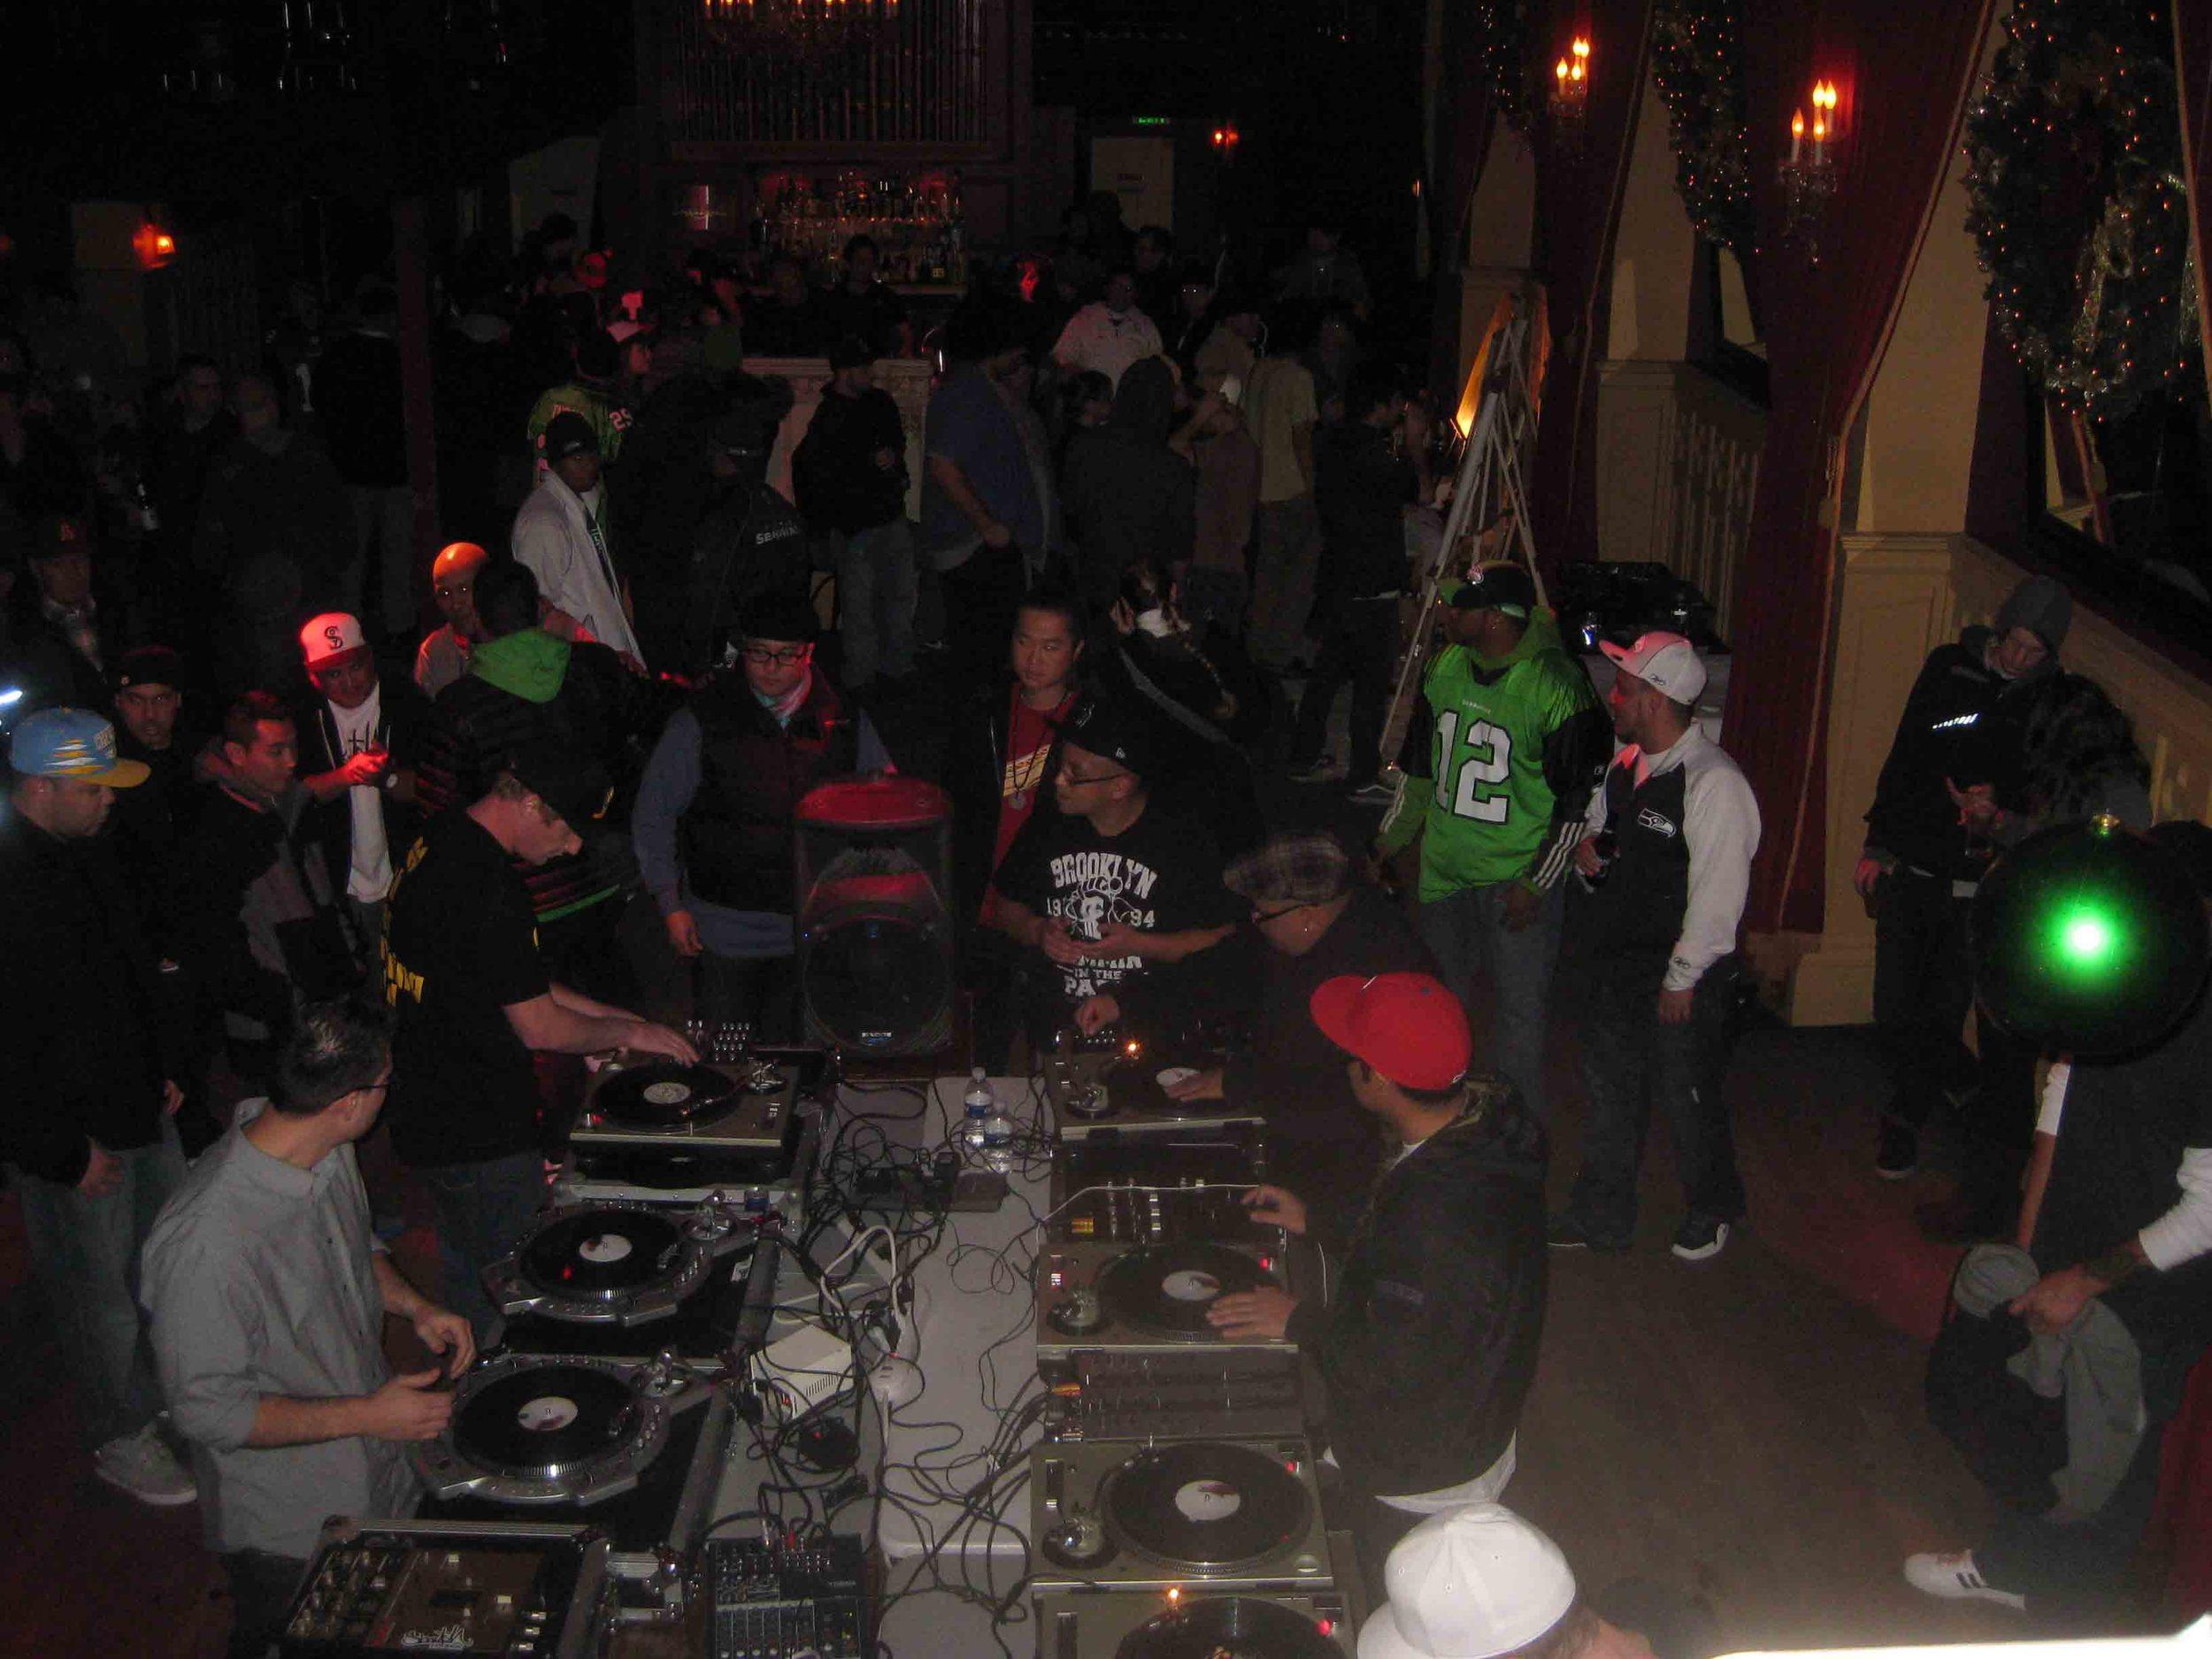 2011_12_01_Skratch Lounge (Tre & Shmix) (6).jpg